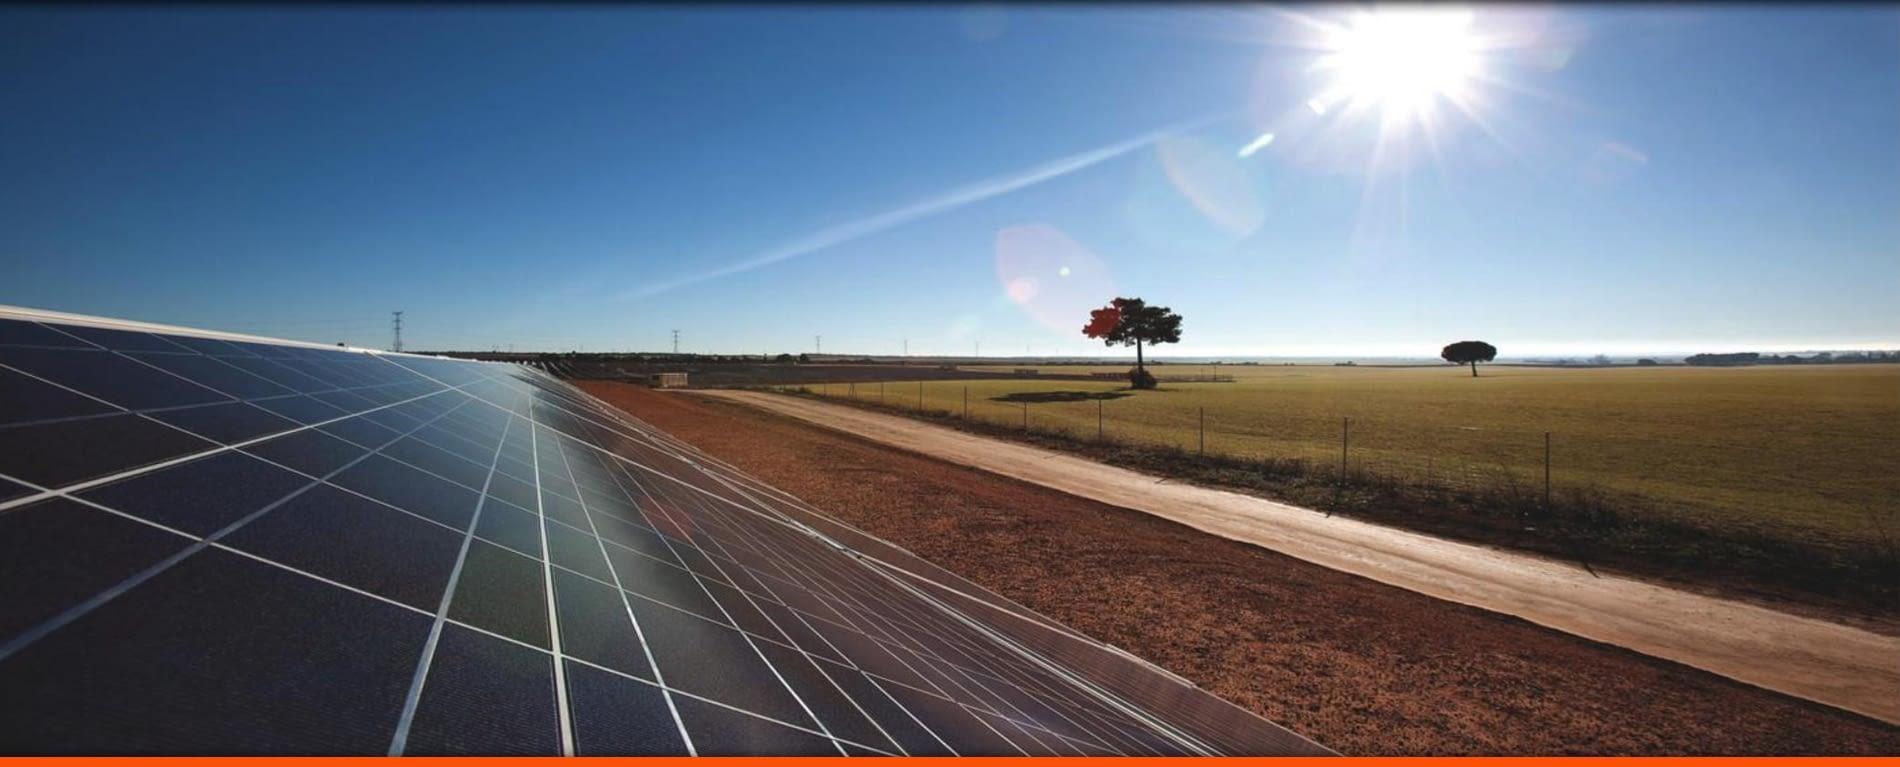 Nerta Solar Photovoltaic Solar